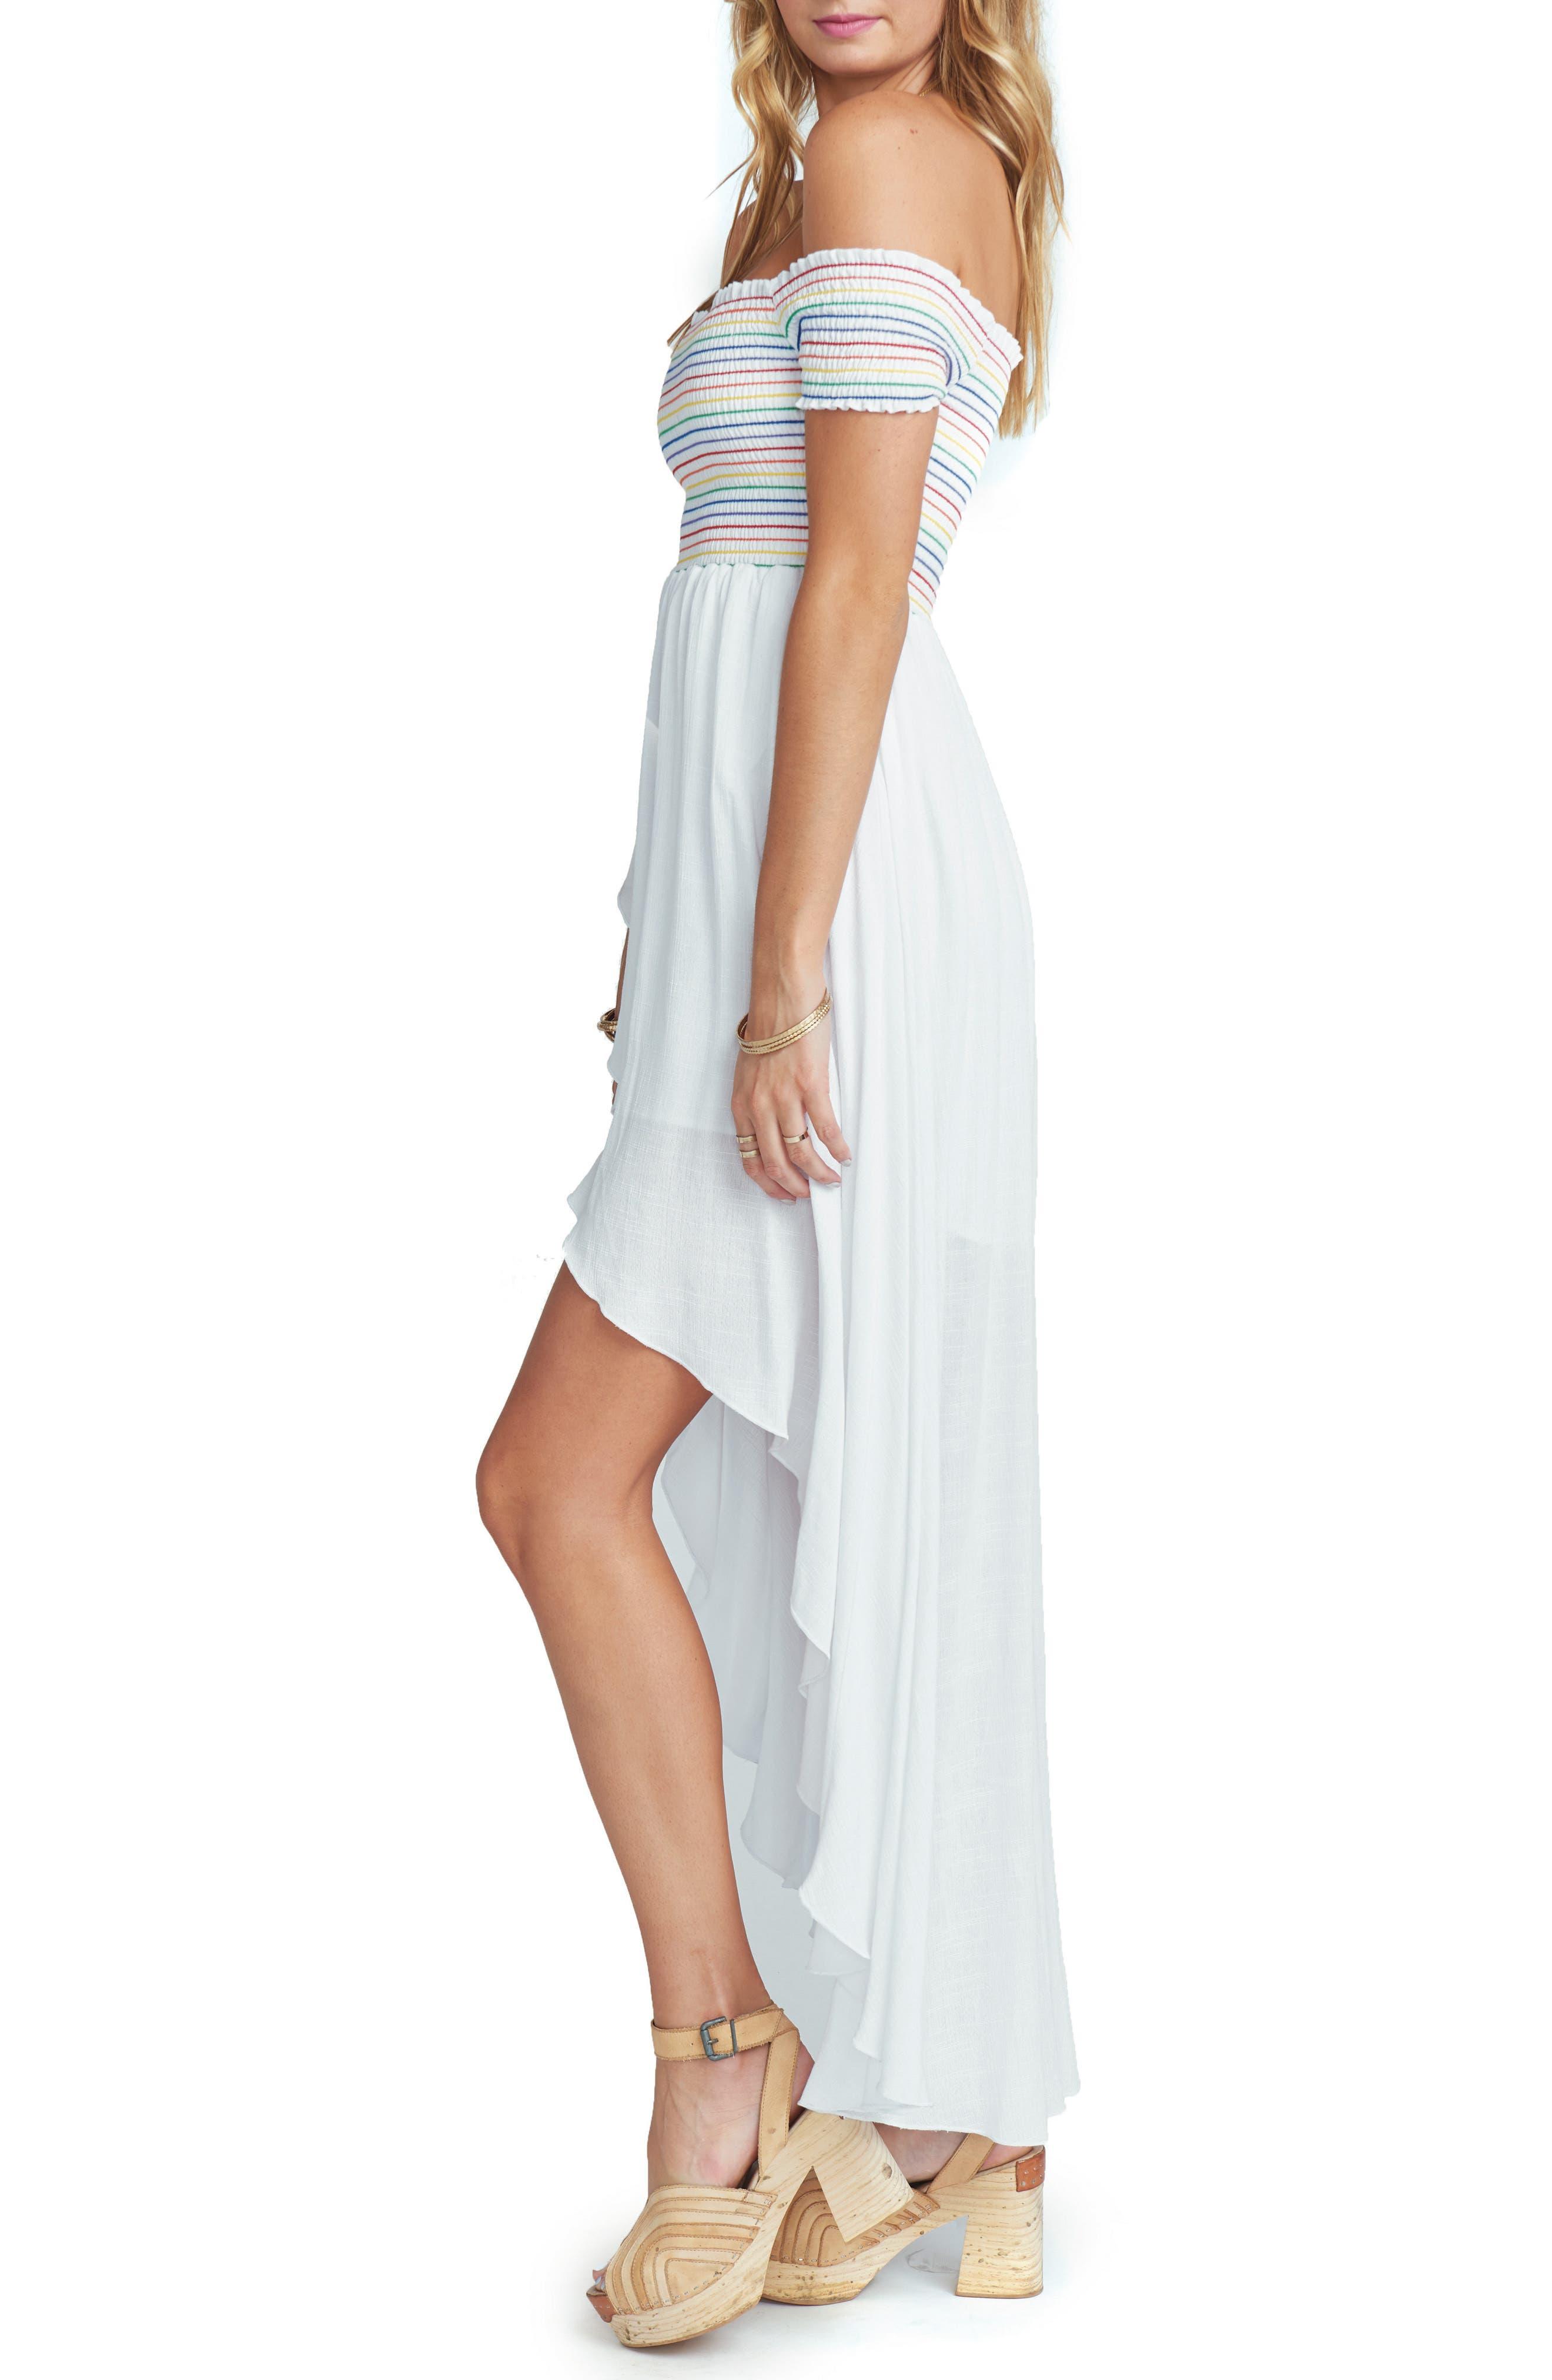 Willa Maxi Dress,                             Alternate thumbnail 3, color,                             White Cruise With Rainbow